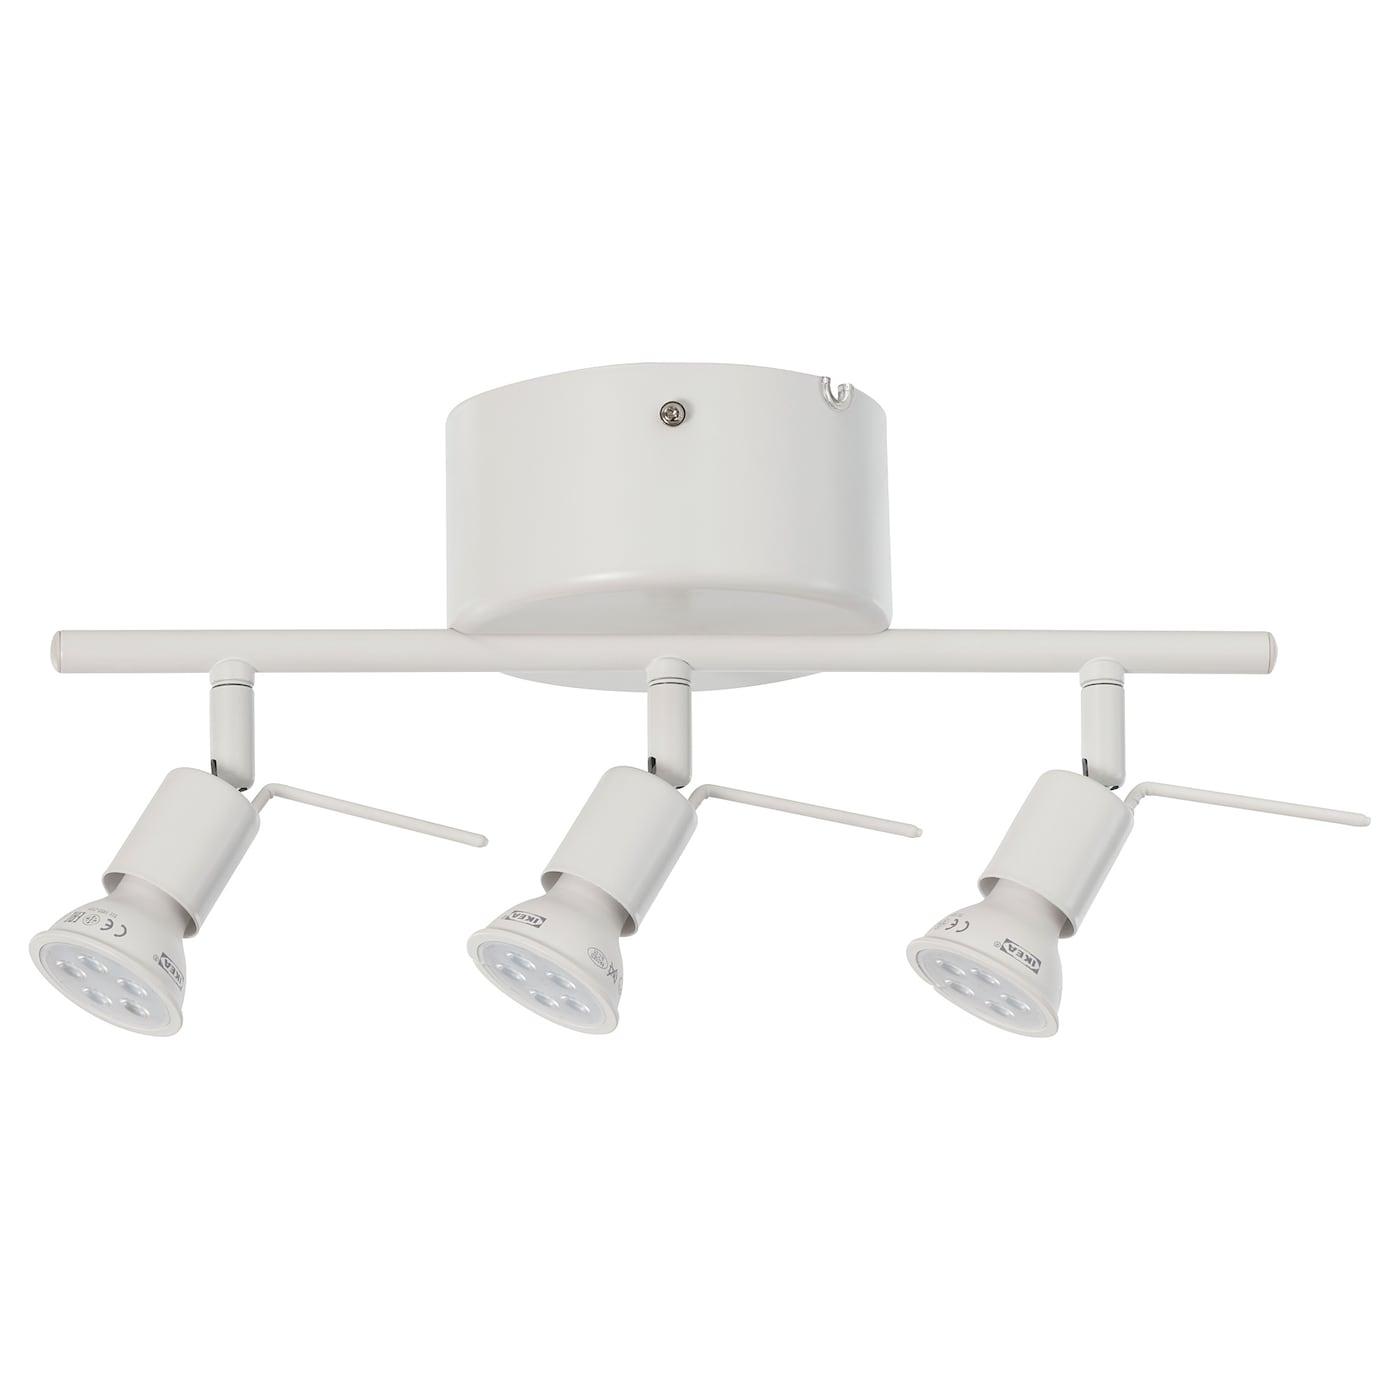 Suspension Plafonniers Ikea